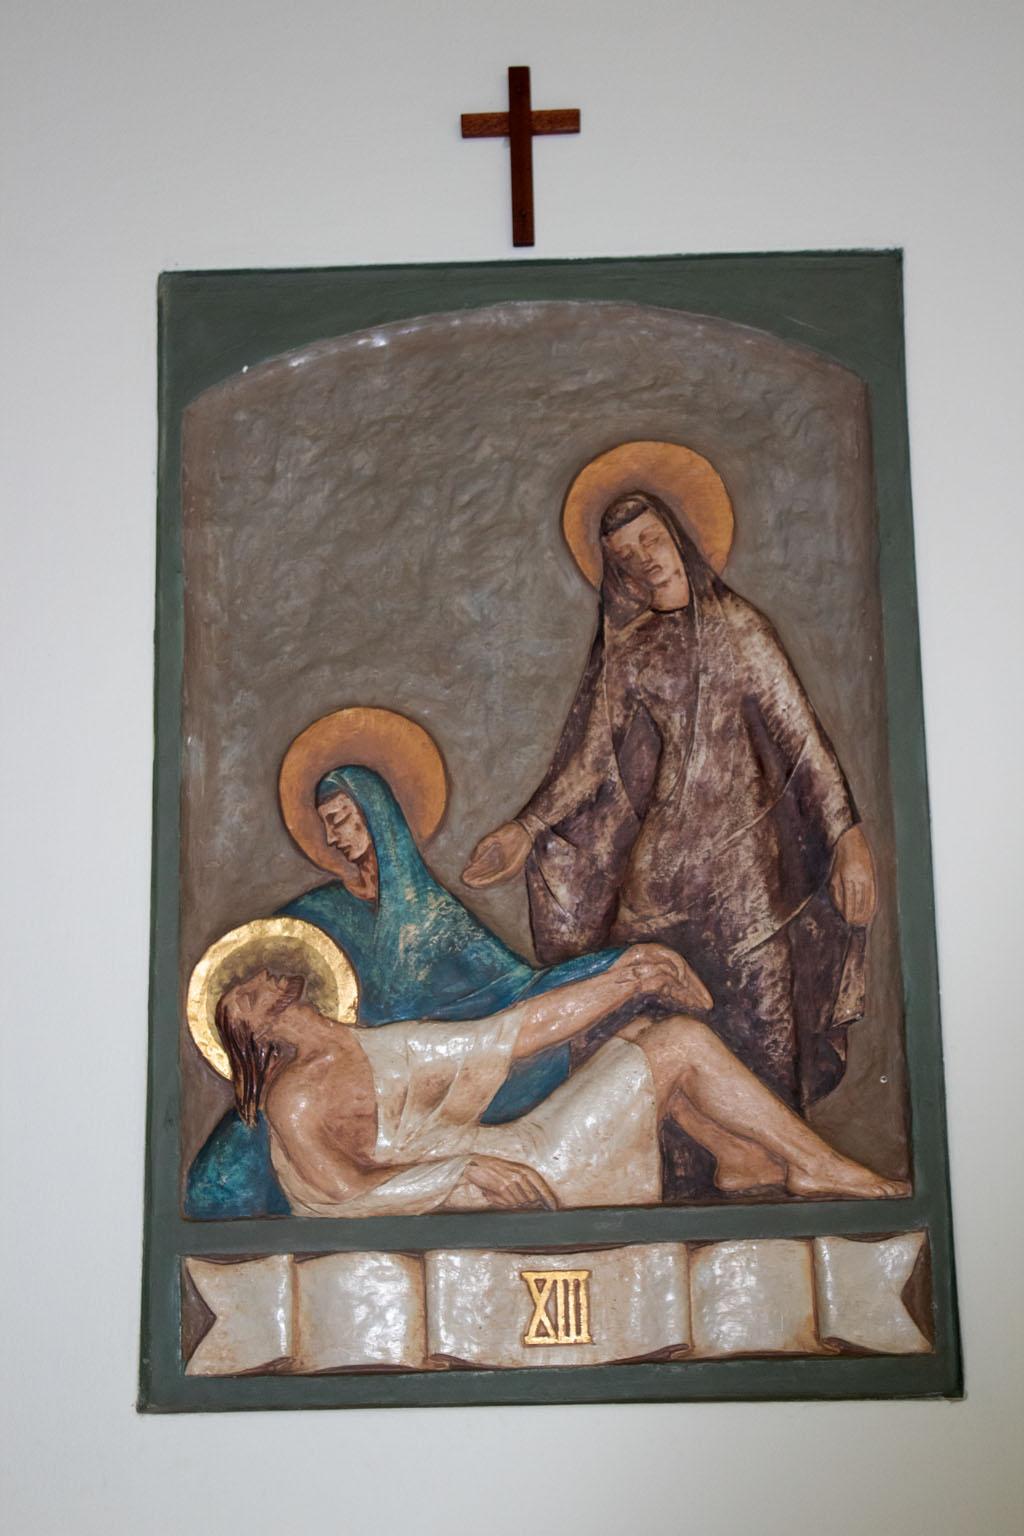 Thirteenth Station of the cross by Dora de Pédery Hunt